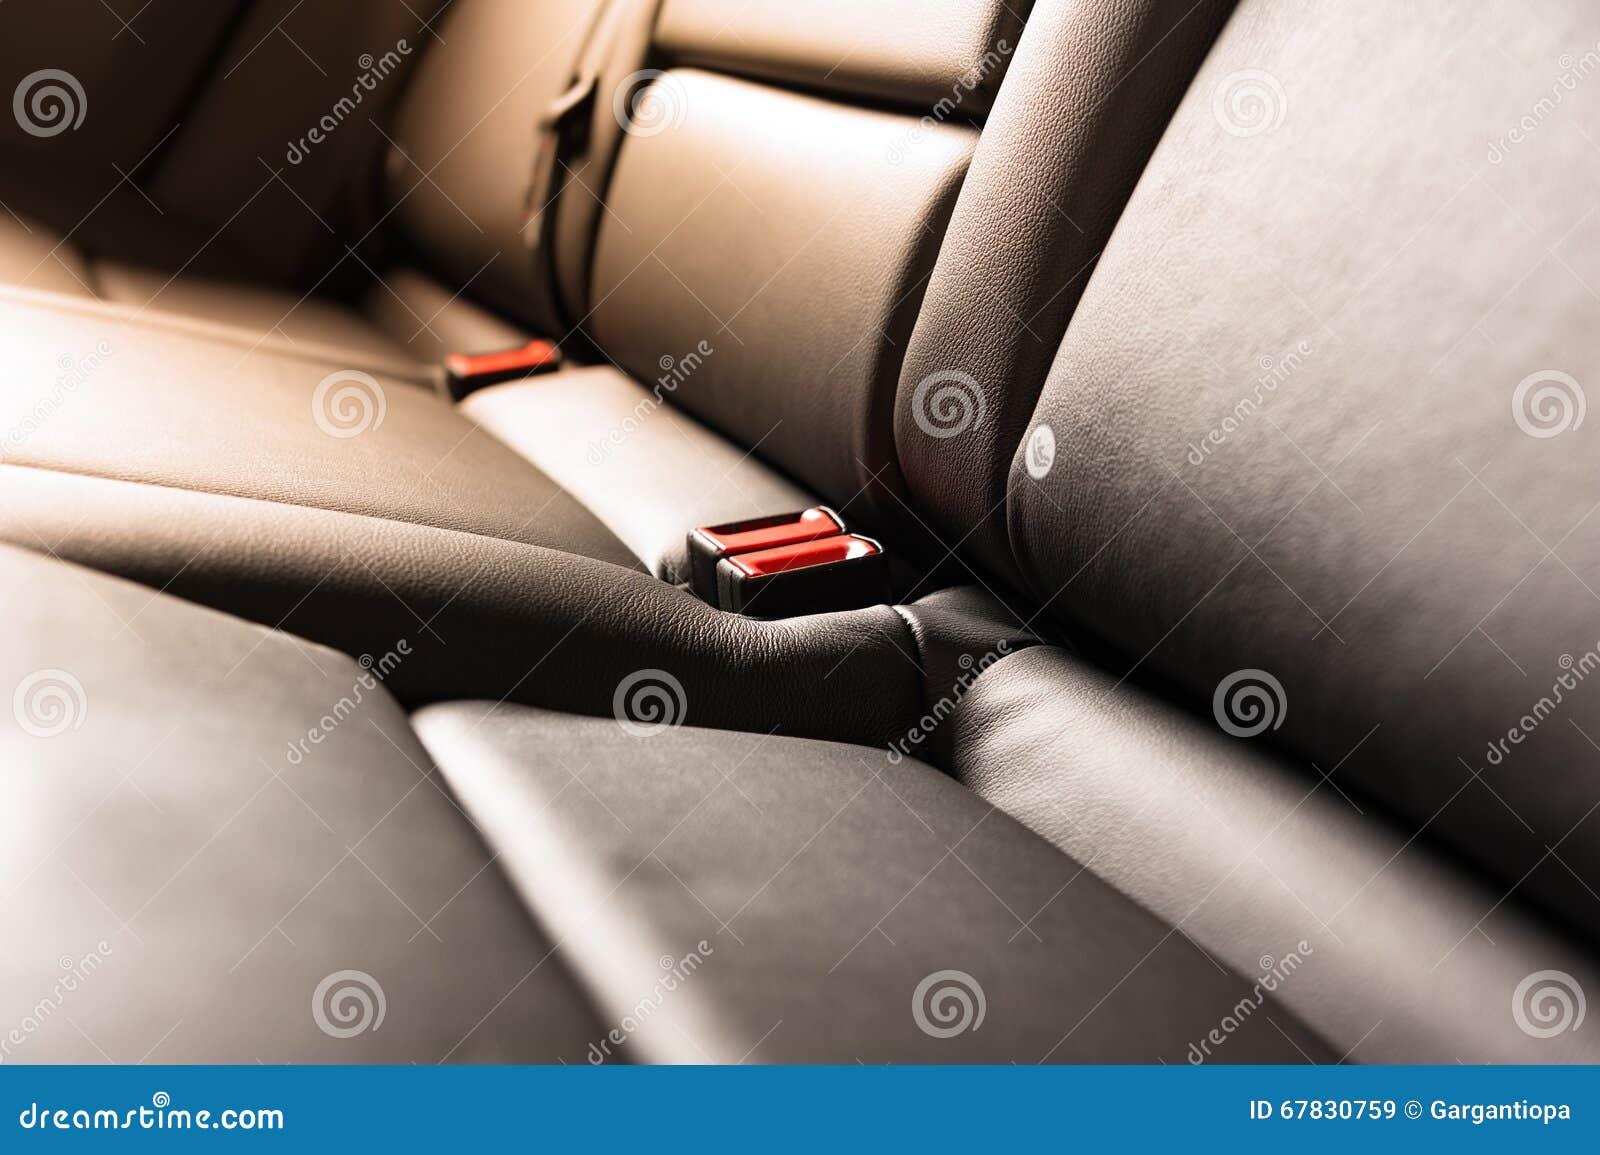 car interior black leather stock photo image 67830759. Black Bedroom Furniture Sets. Home Design Ideas